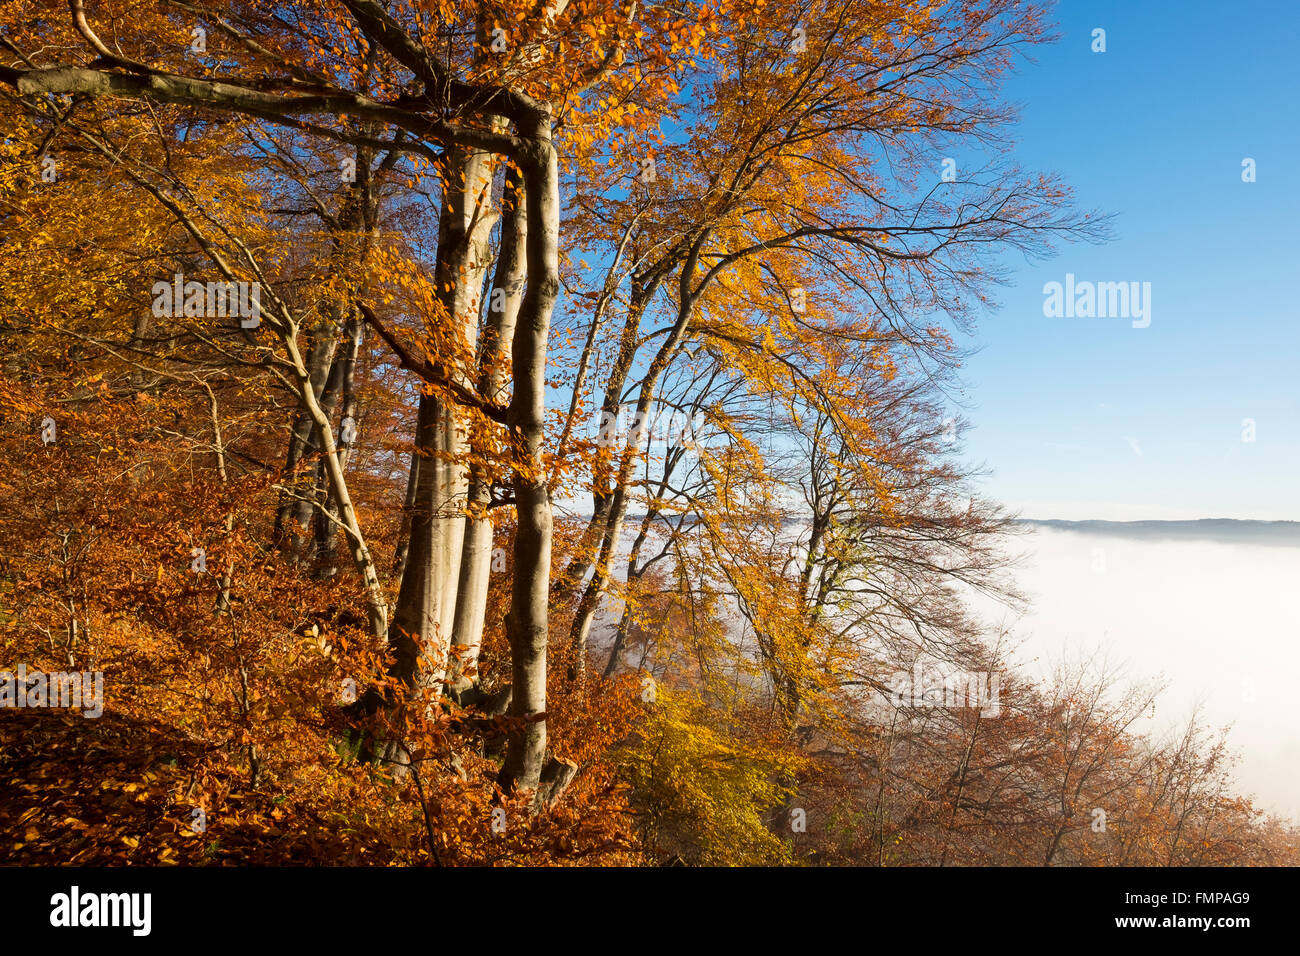 Autumnal beeches, mist over Pupplinger Au, Schlederloh in Icking, Upper Bavaria, Bavaria, Germany - Stock Image